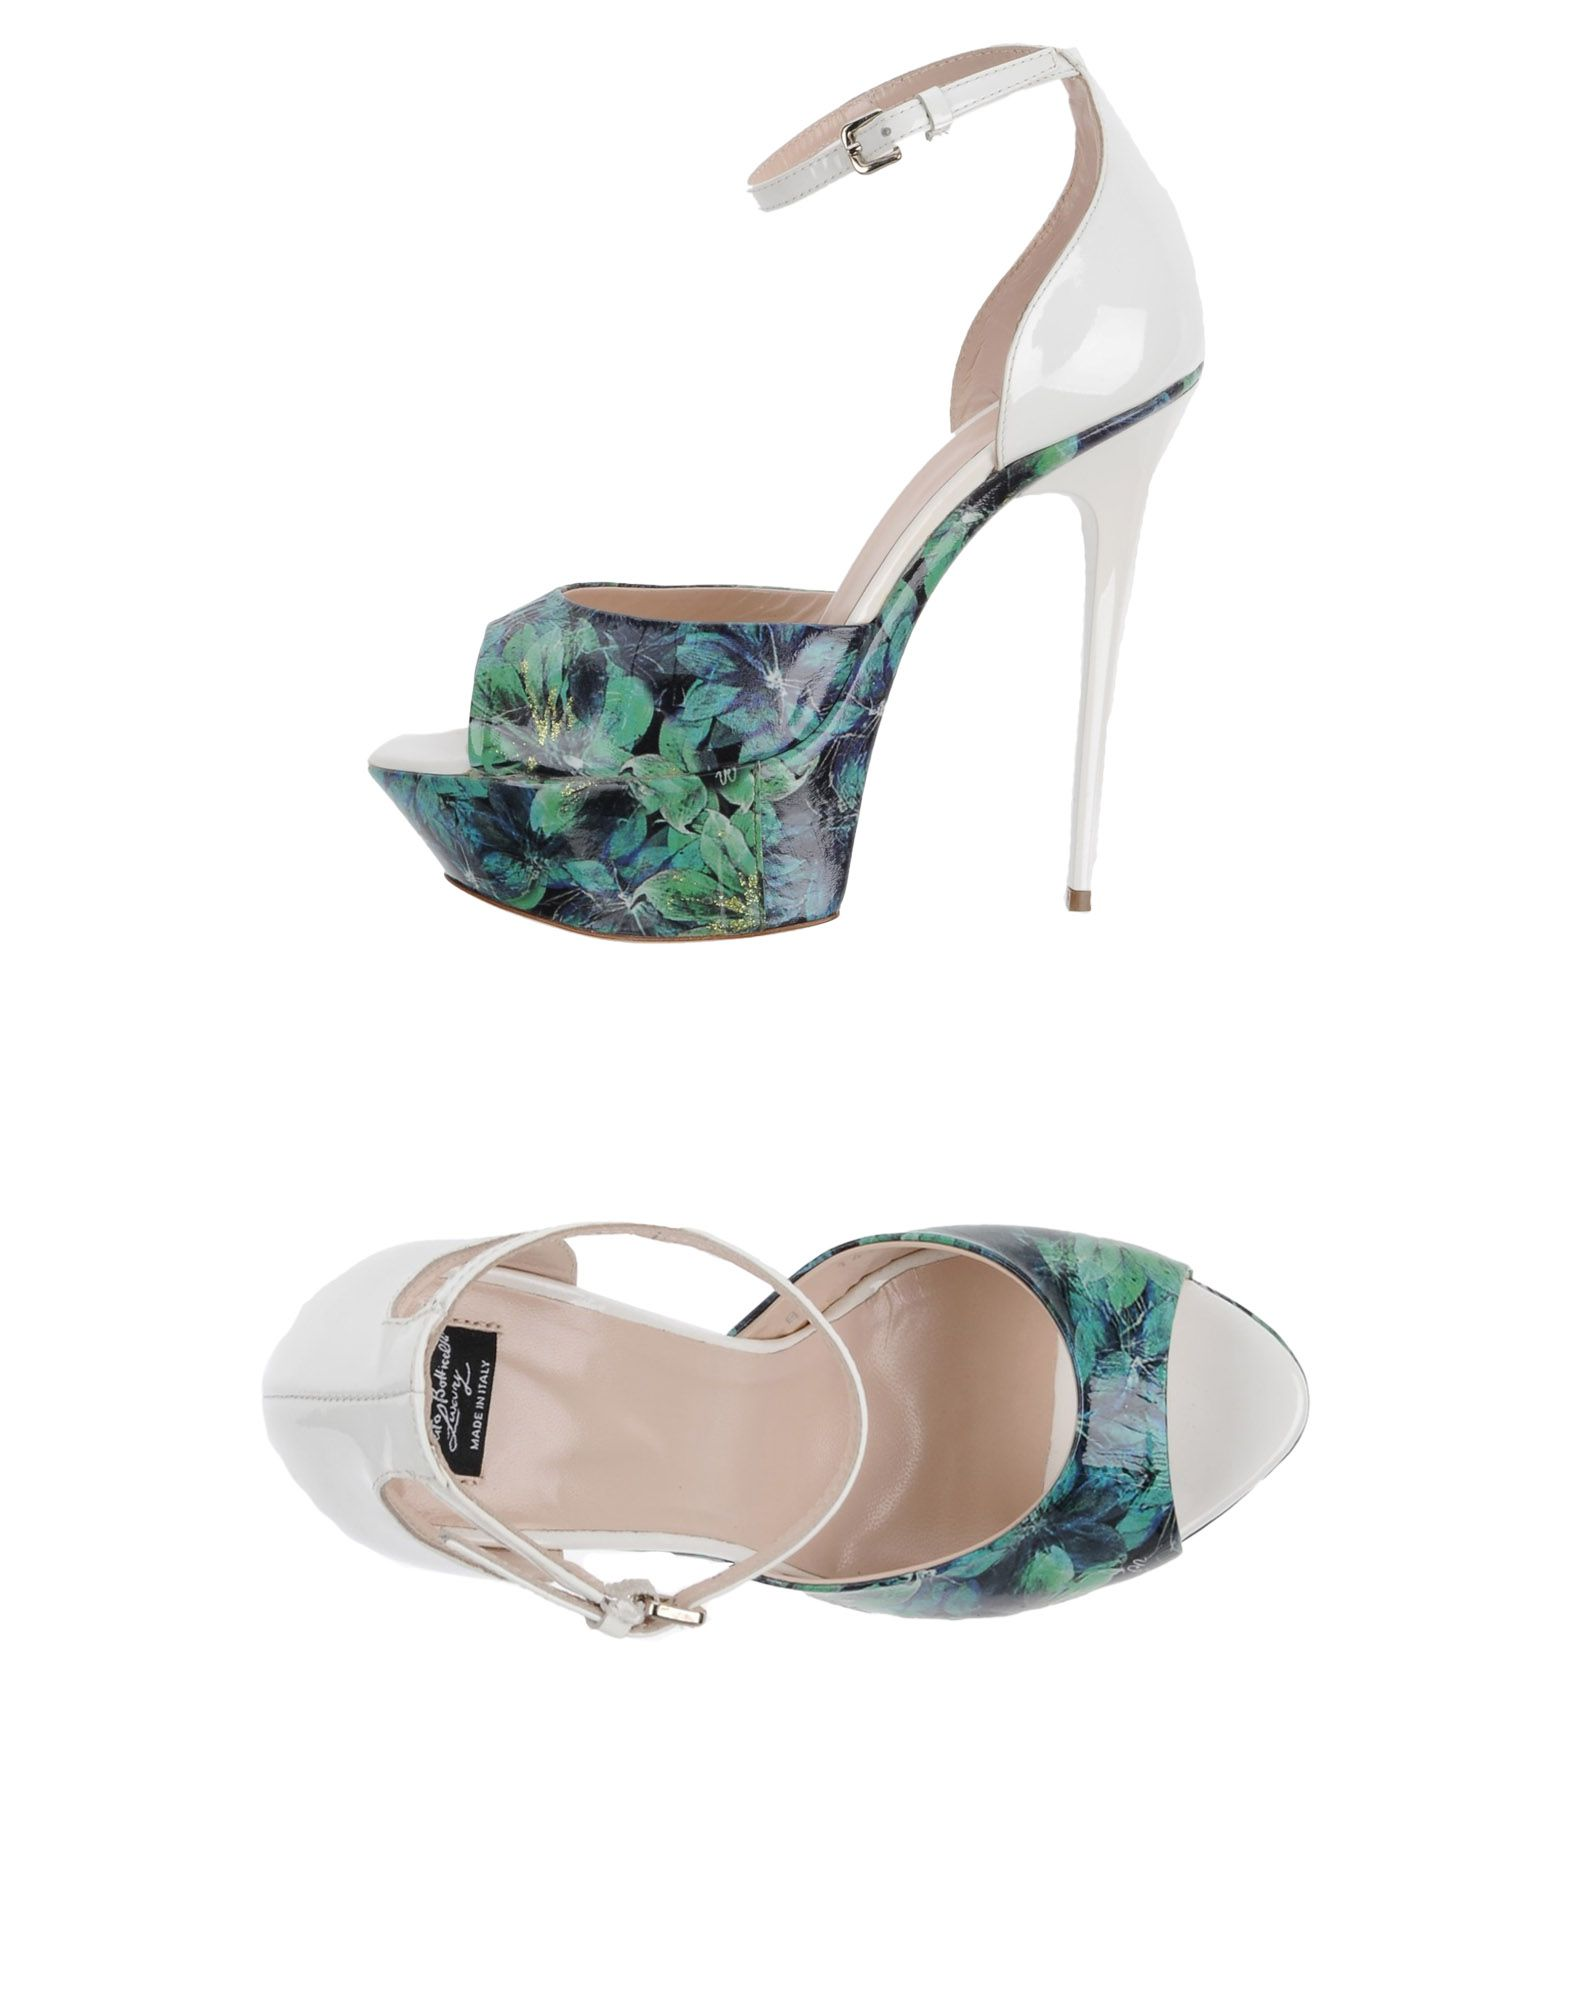 roberto botticelli luxury полусапоги и высокие ботинки ROBERTO BOTTICELLI LUXURY Сандалии